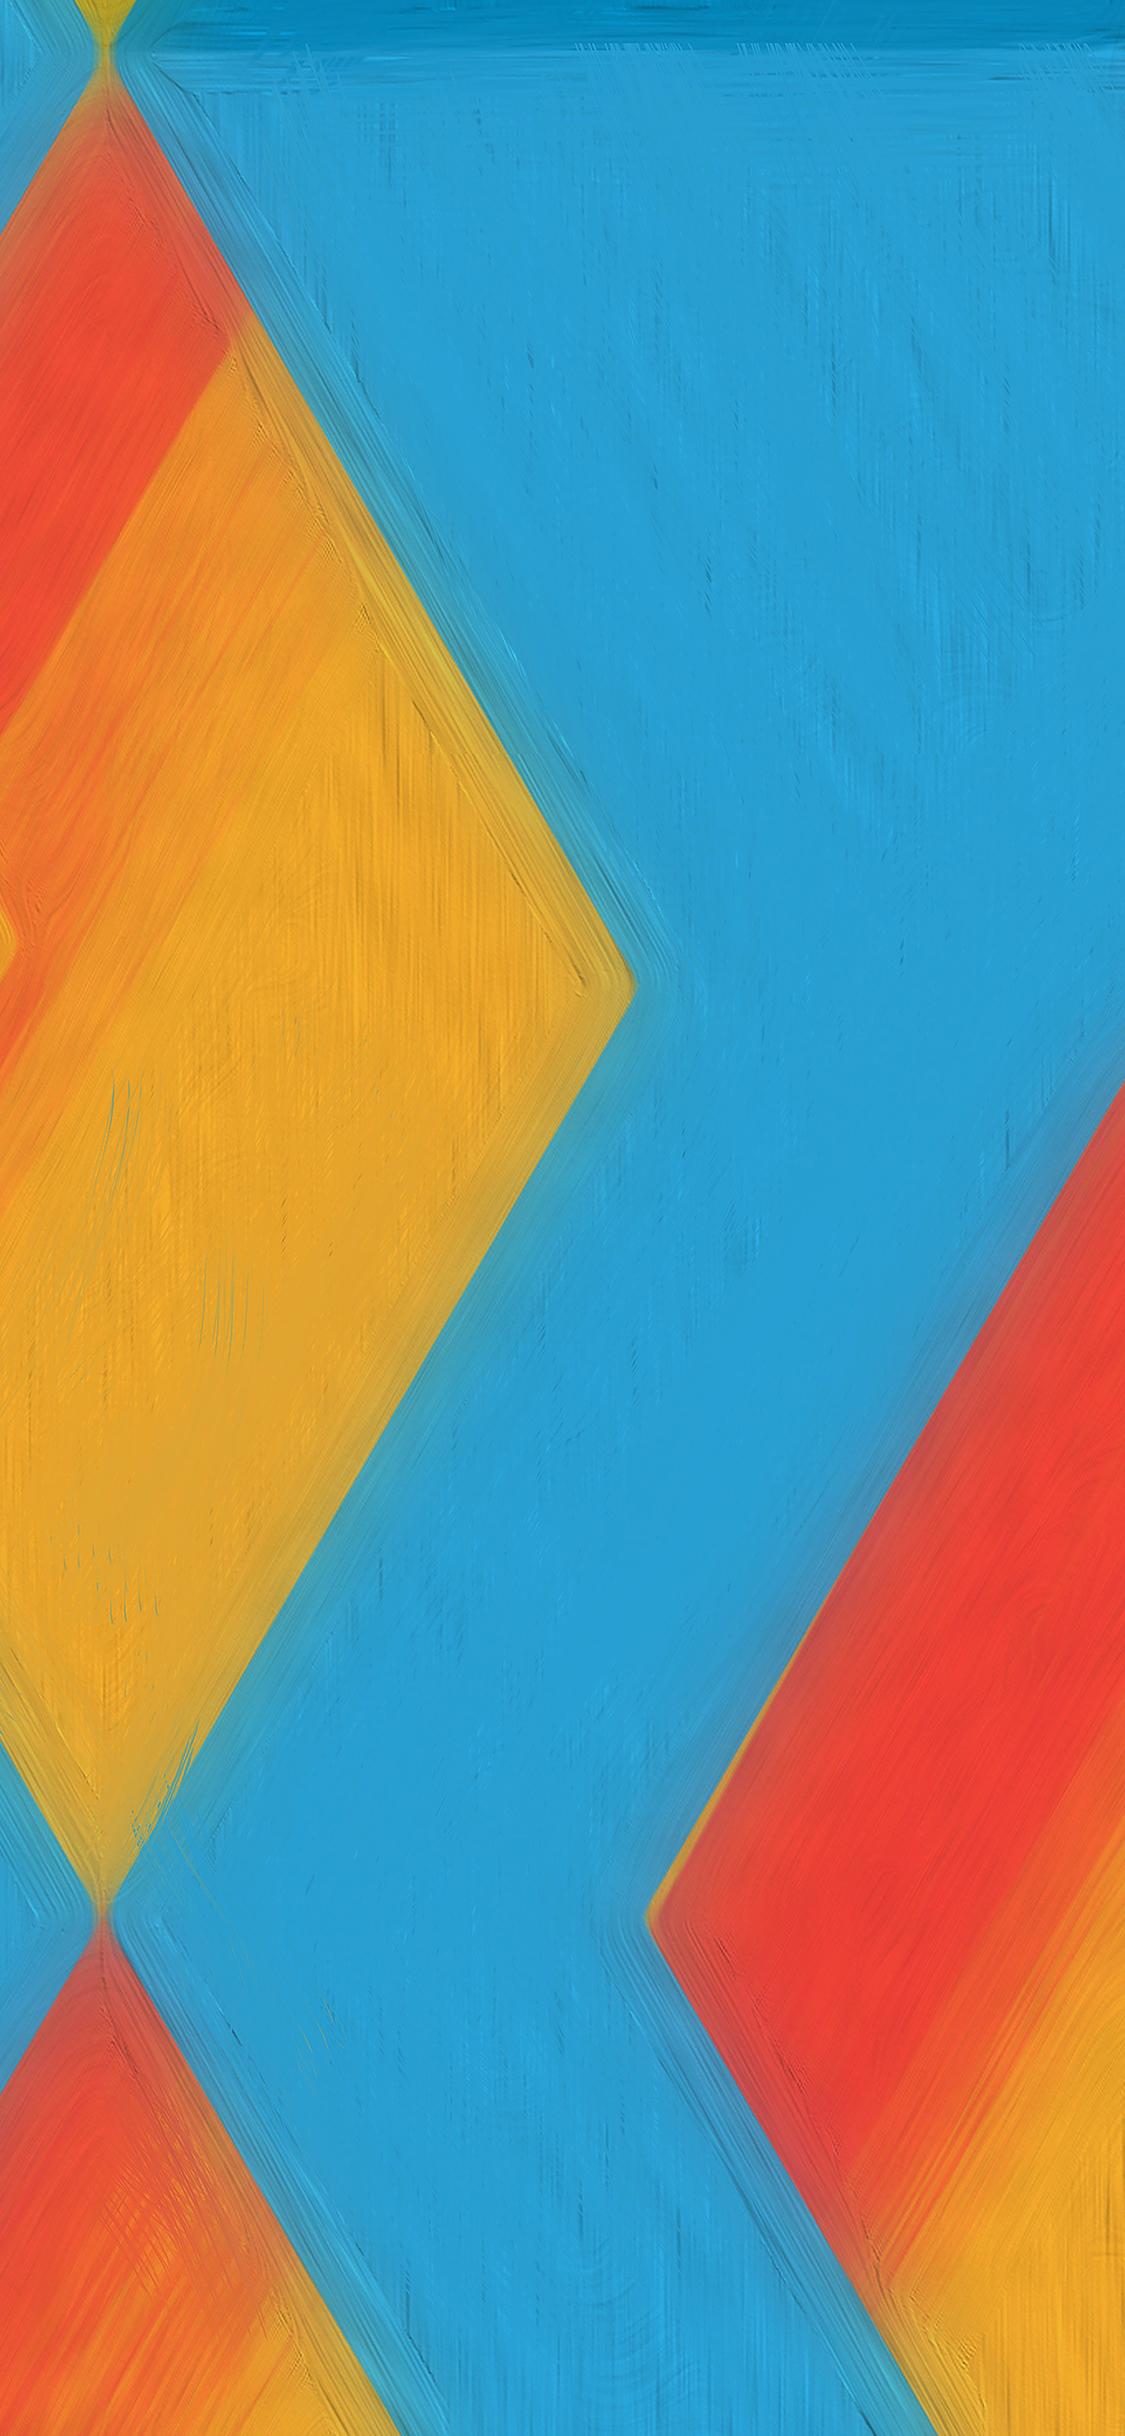 iPhoneXpapers.com-Apple-iPhone-wallpaper-vd75-android-lollipop-wallpaper-art-paint-pattern